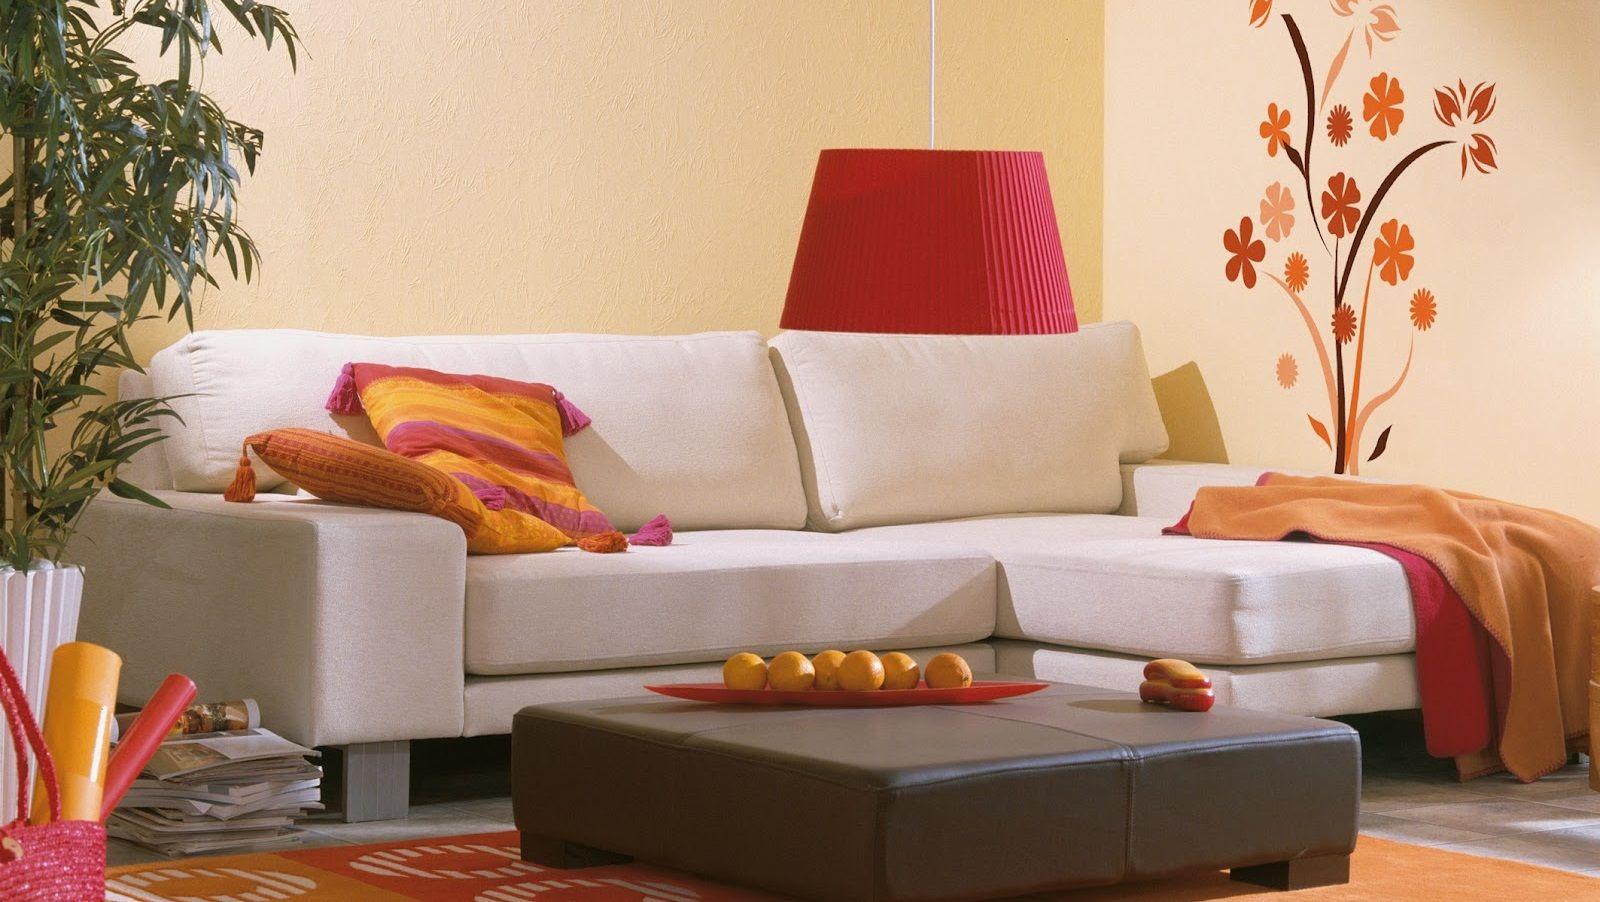 Pin de cristian mart nez en lobby pinterest colores - Decoracion de hogar ...